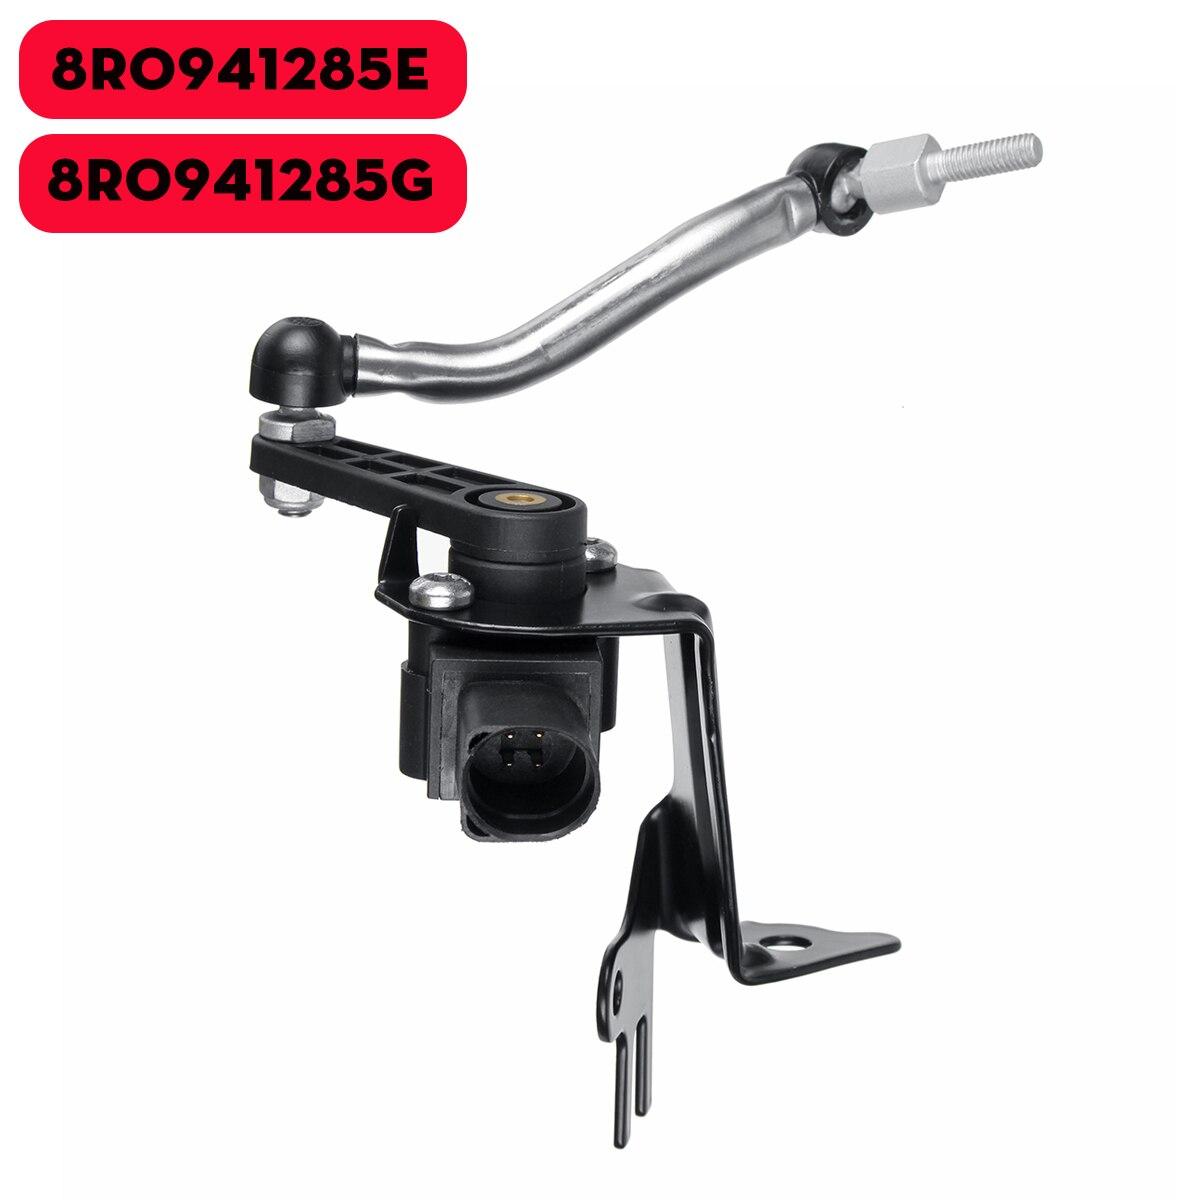 Araba Ön Sol Far Yükseklik Seviyesi Sensörü 8R0941285E Audi Q5 2009-2017 SQ5 2014-2017